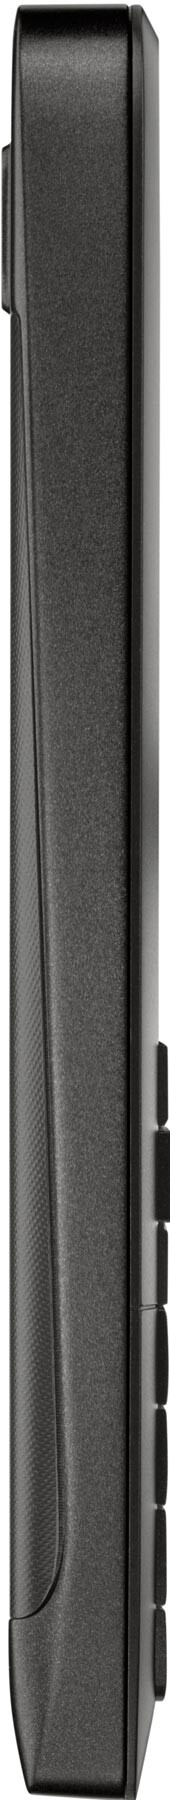 Nokia E52 US